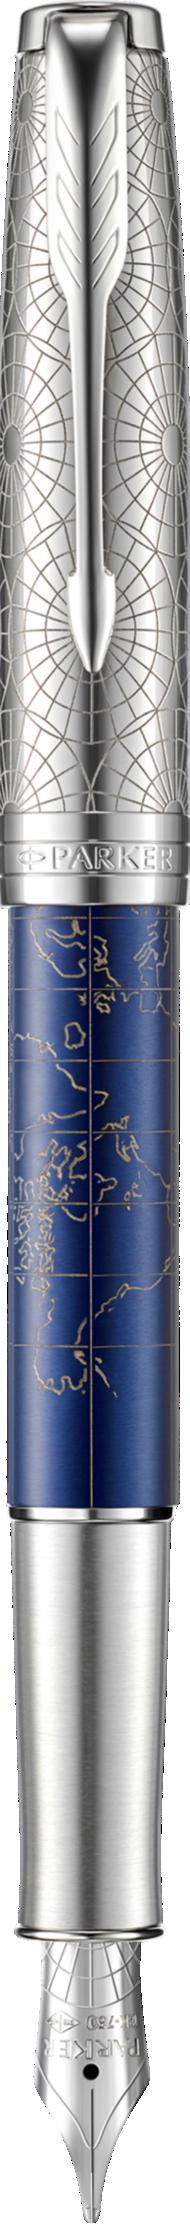 sonnet atlas